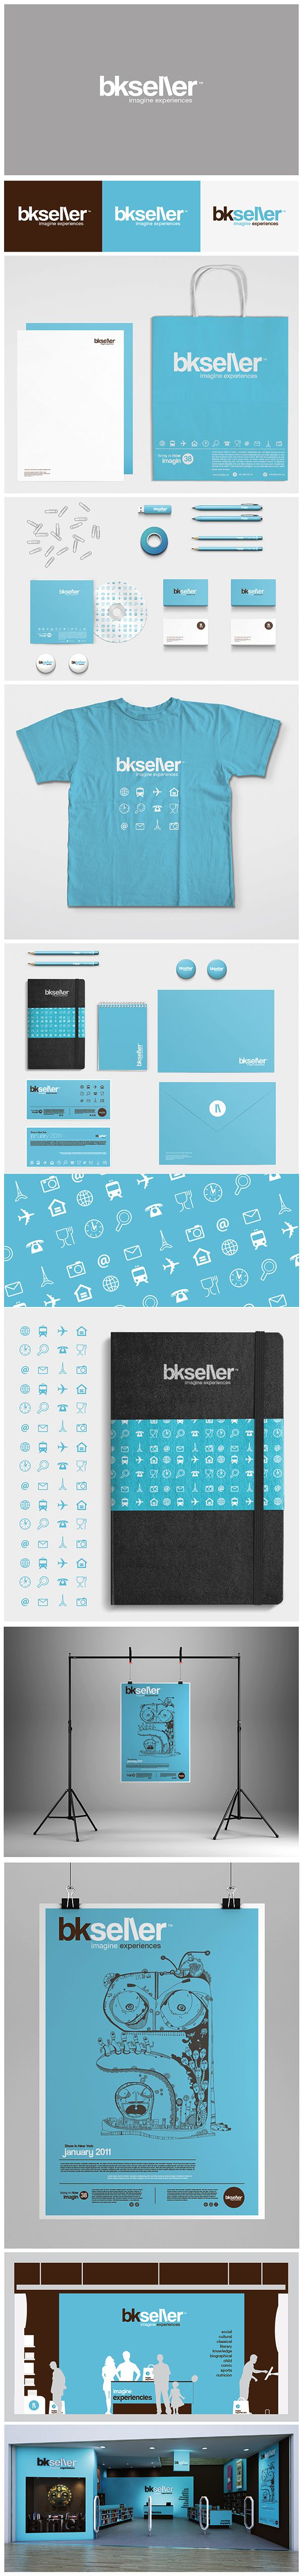 bkseller by Mister Onüff by misteronüff , via Behance #identity #packaging #branding PD